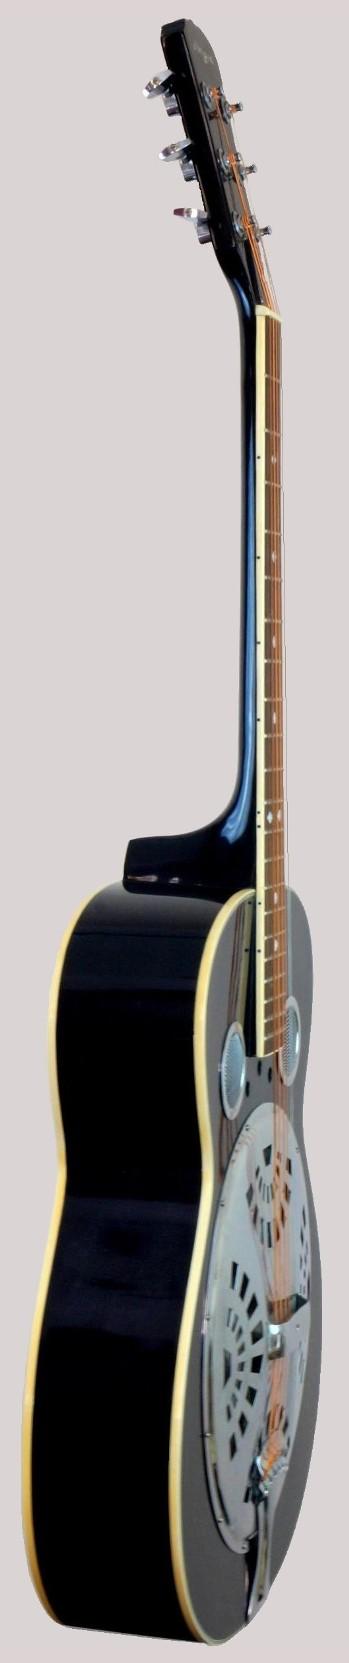 Chinese single cone dobro resonator Guitar